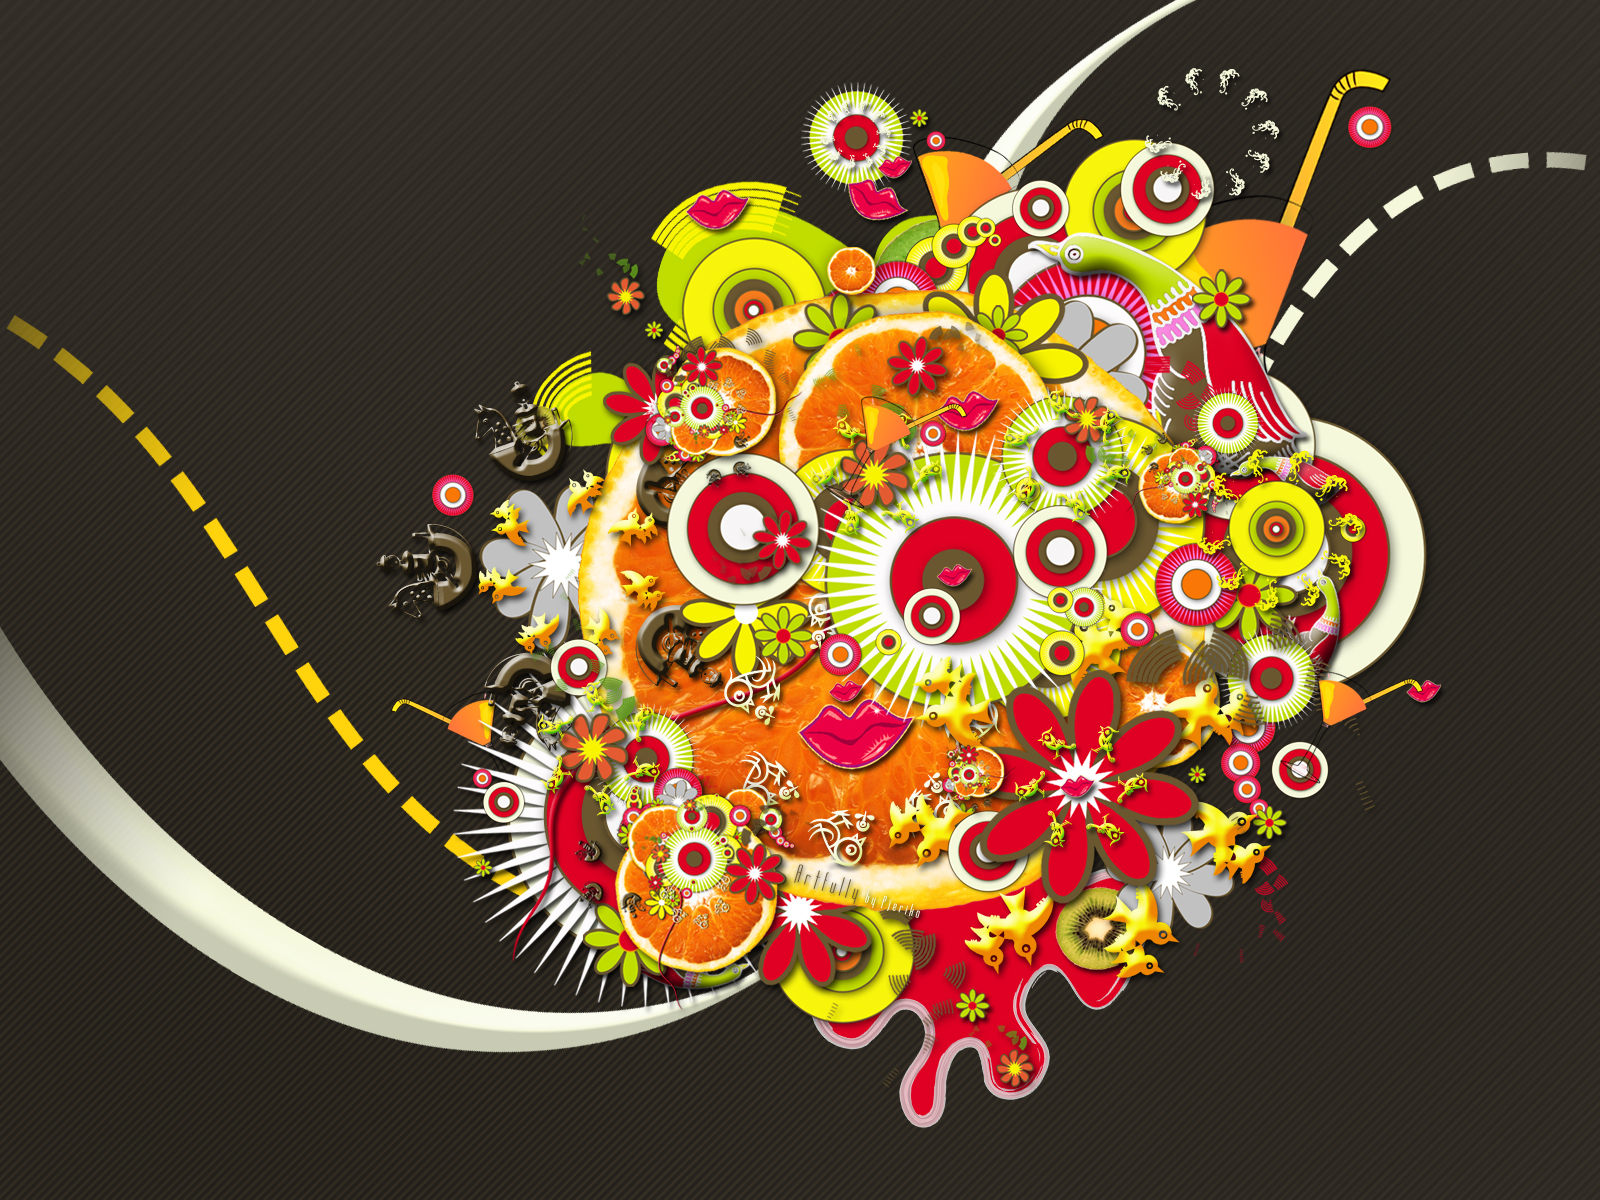 Artfully by Pjeriko